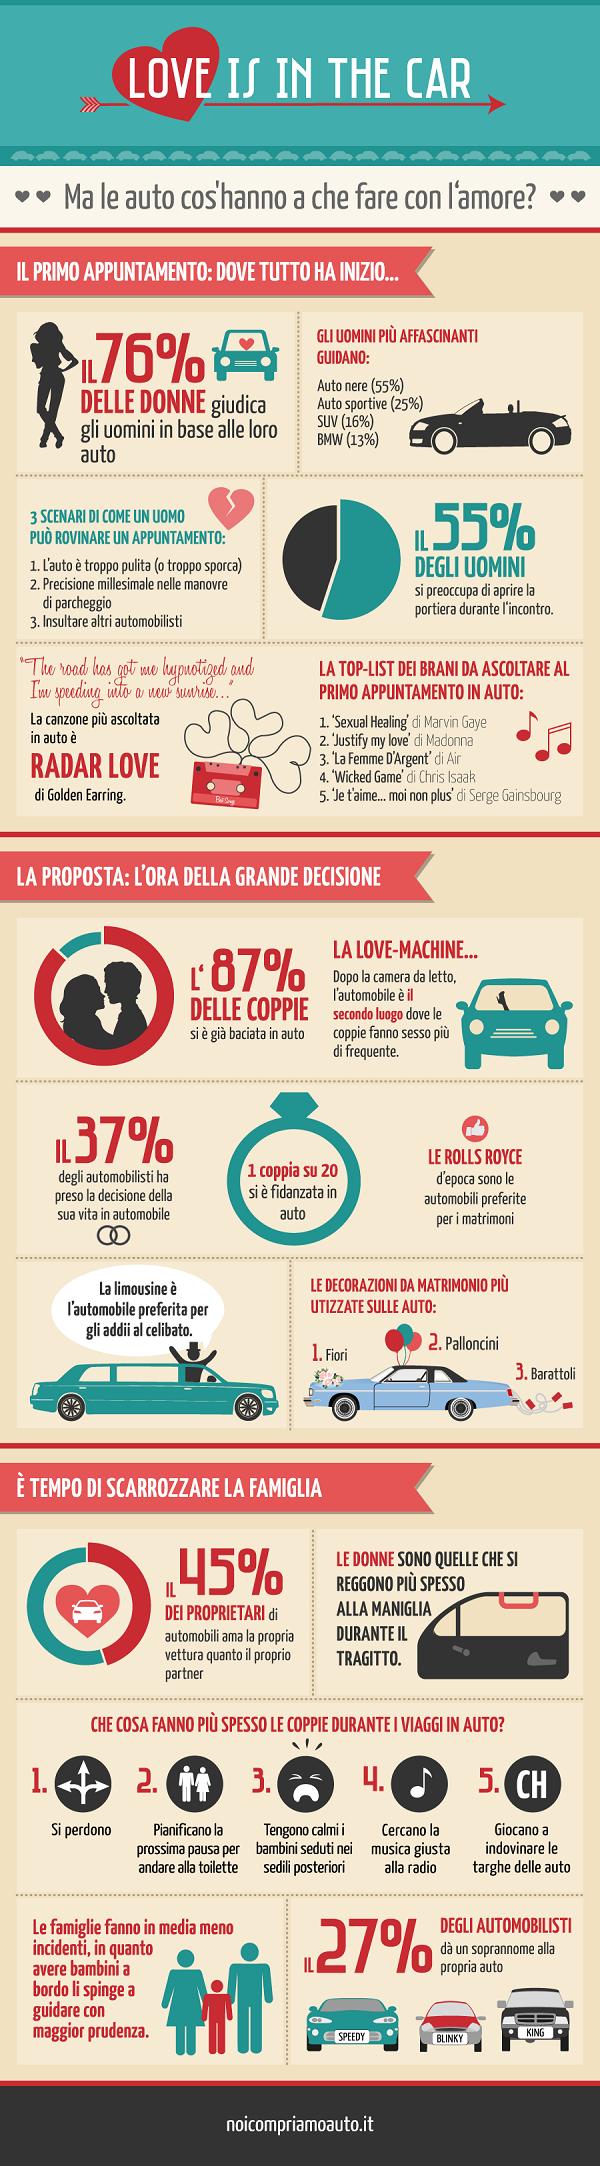 amore e automobili